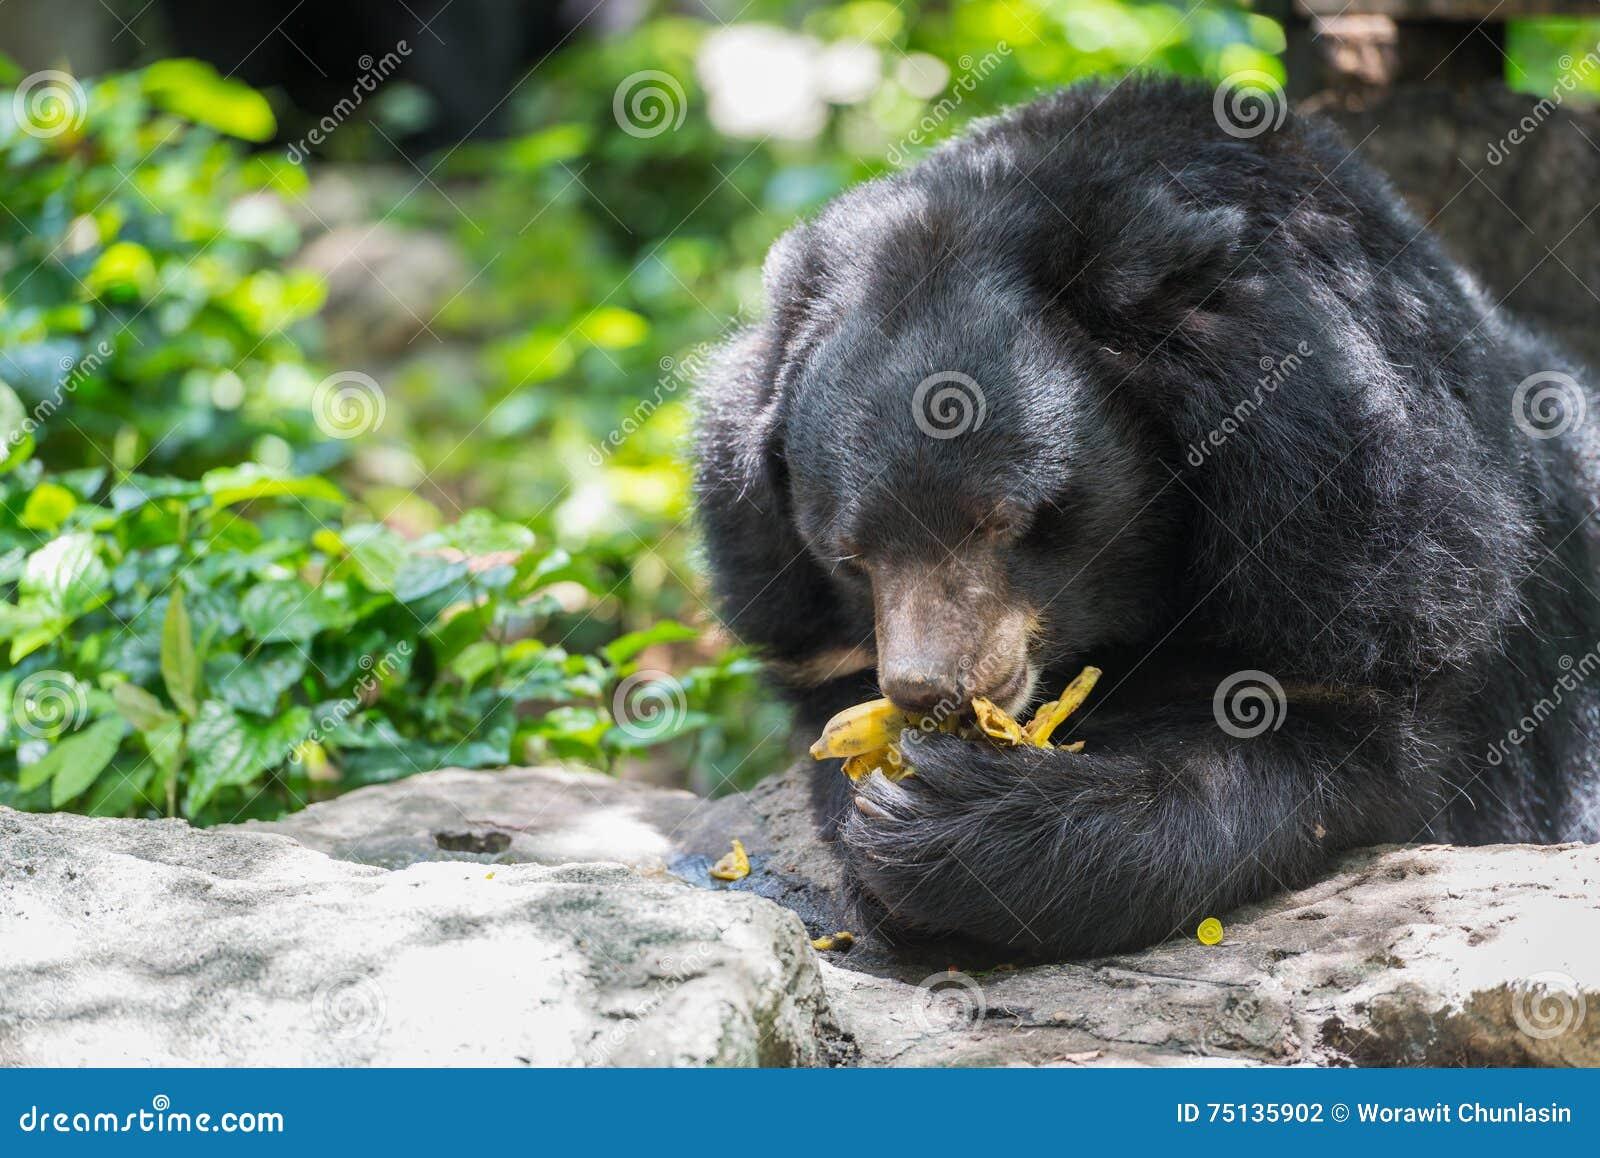 Ursus Thibetanus Eating Banana Stock Photo Image Of Garden Bear